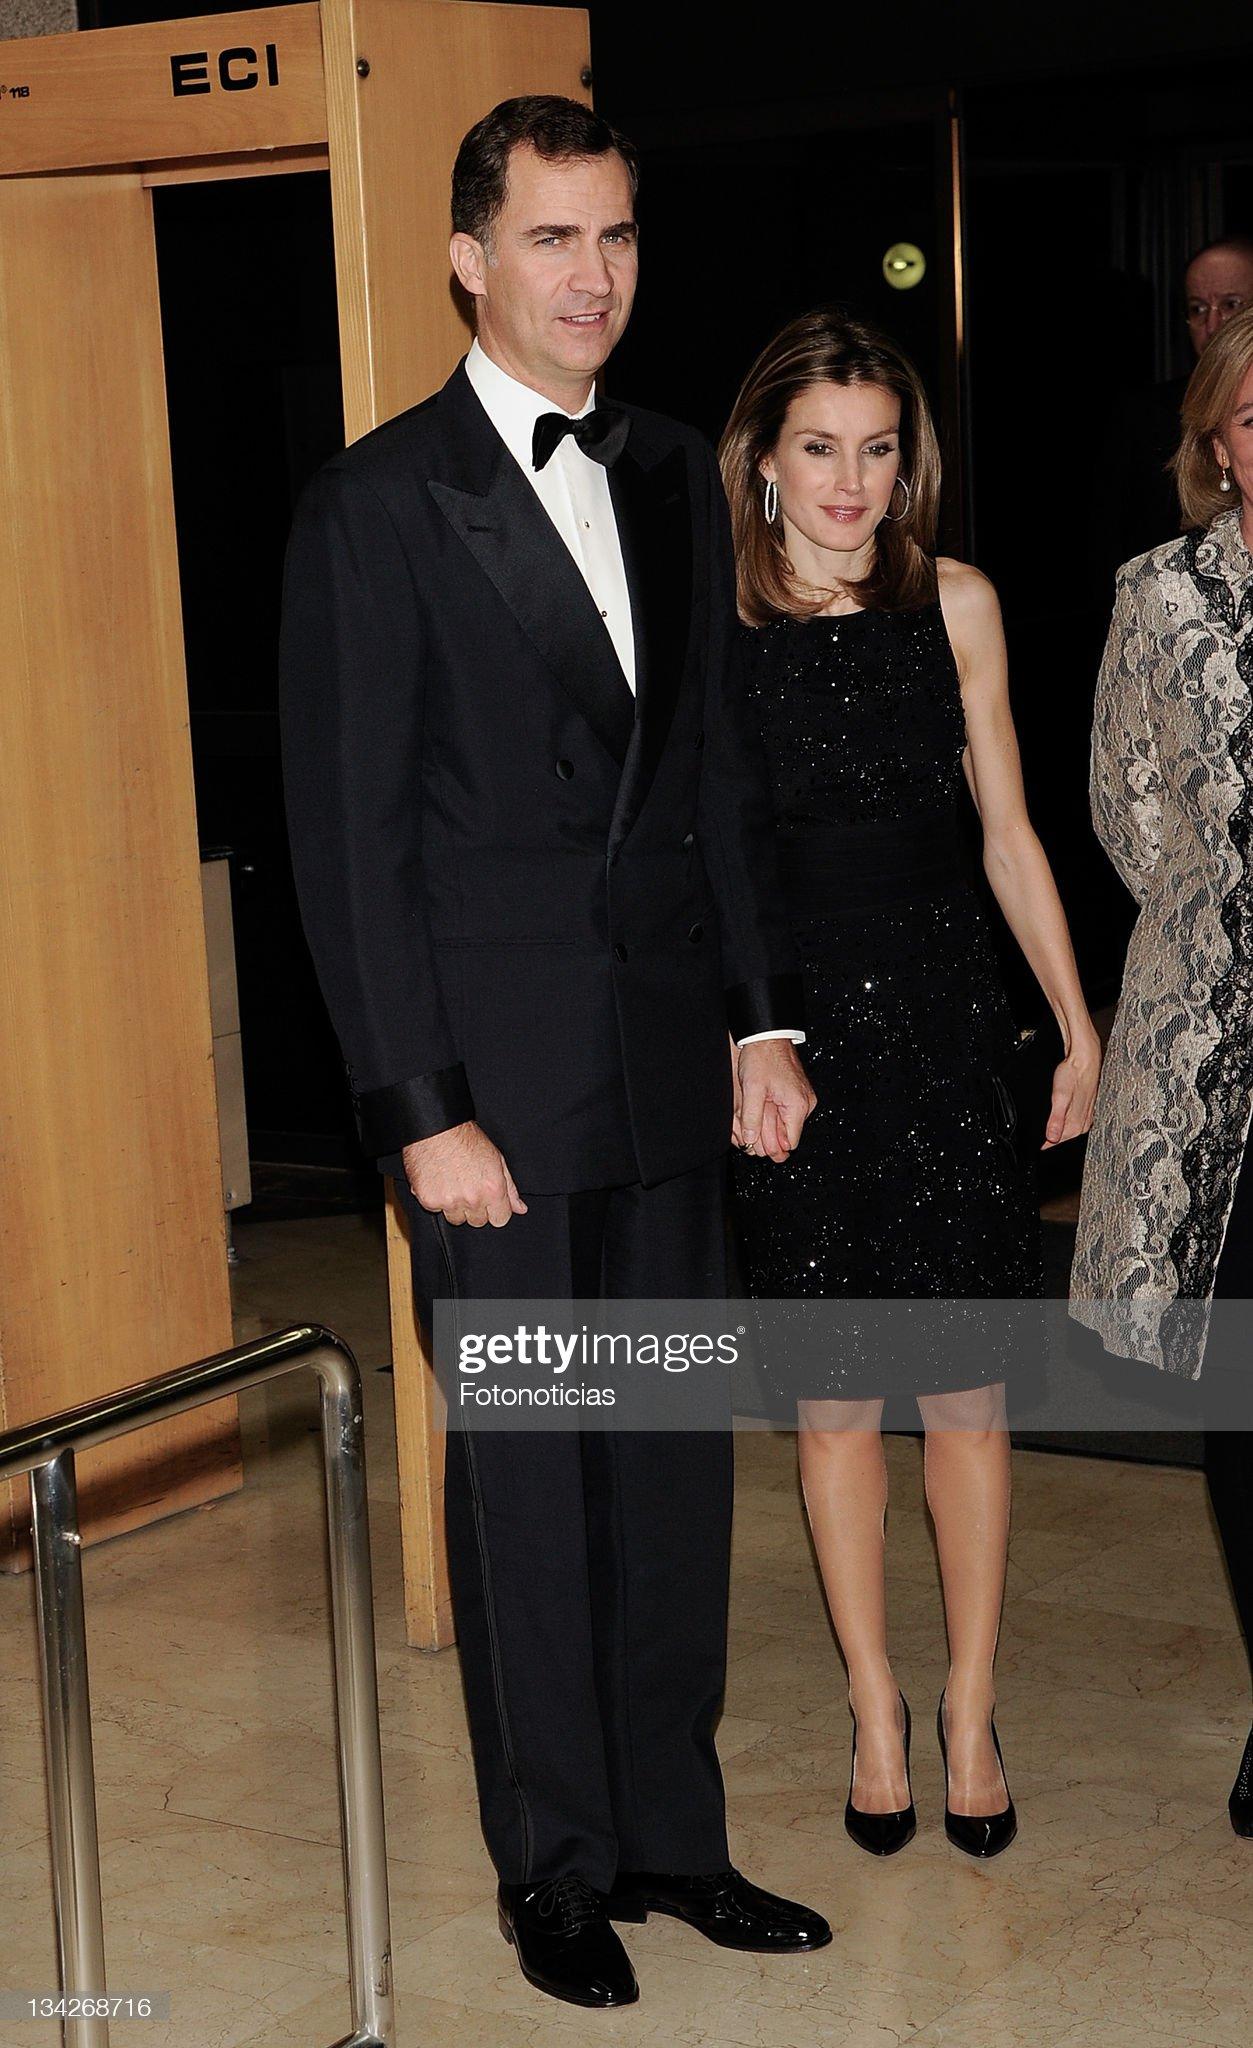 Вечерние наряды Королевы Летиции Spanish Royals Attend a Dinner in Honour of 'Mariano de Cavia', 'Mingote' and 'Luca de Tena' Awards Winners : News Photo